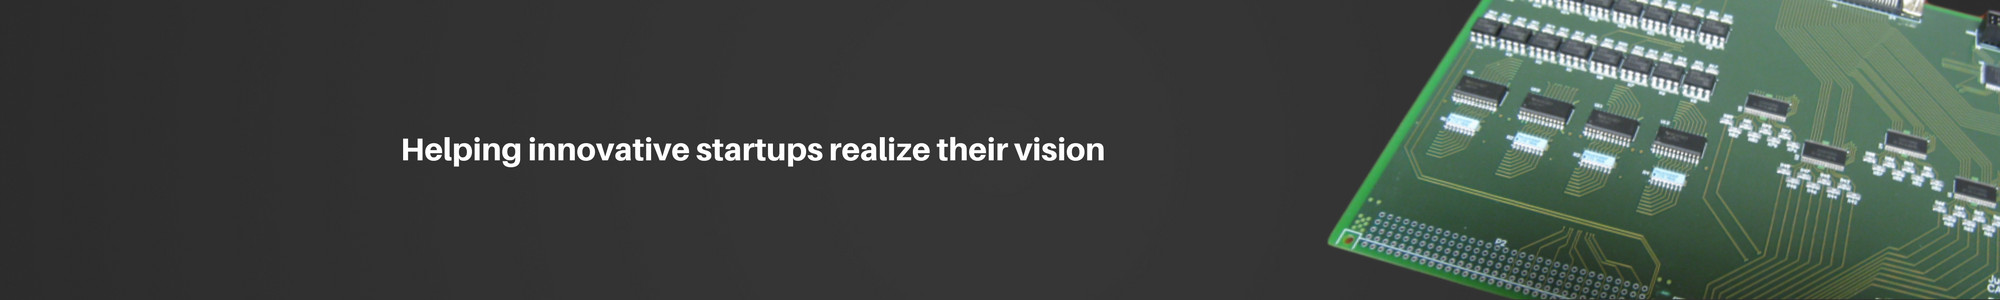 Readix - Startups